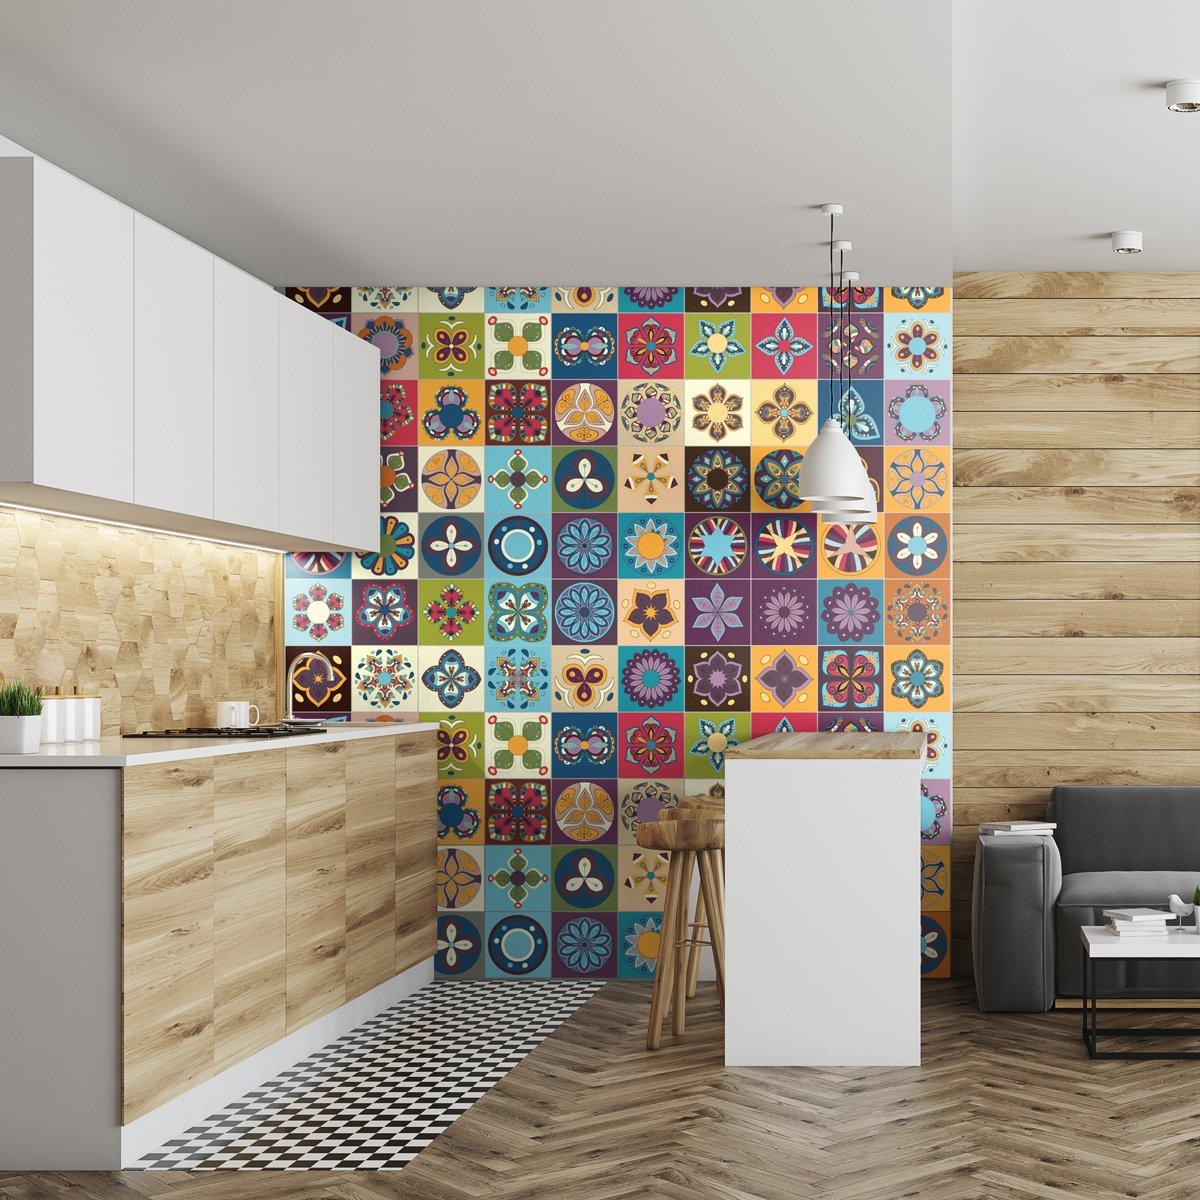 60 pi/èces 20 x 20 cm Stickers adh/ésifs carrelages muraux azulejos